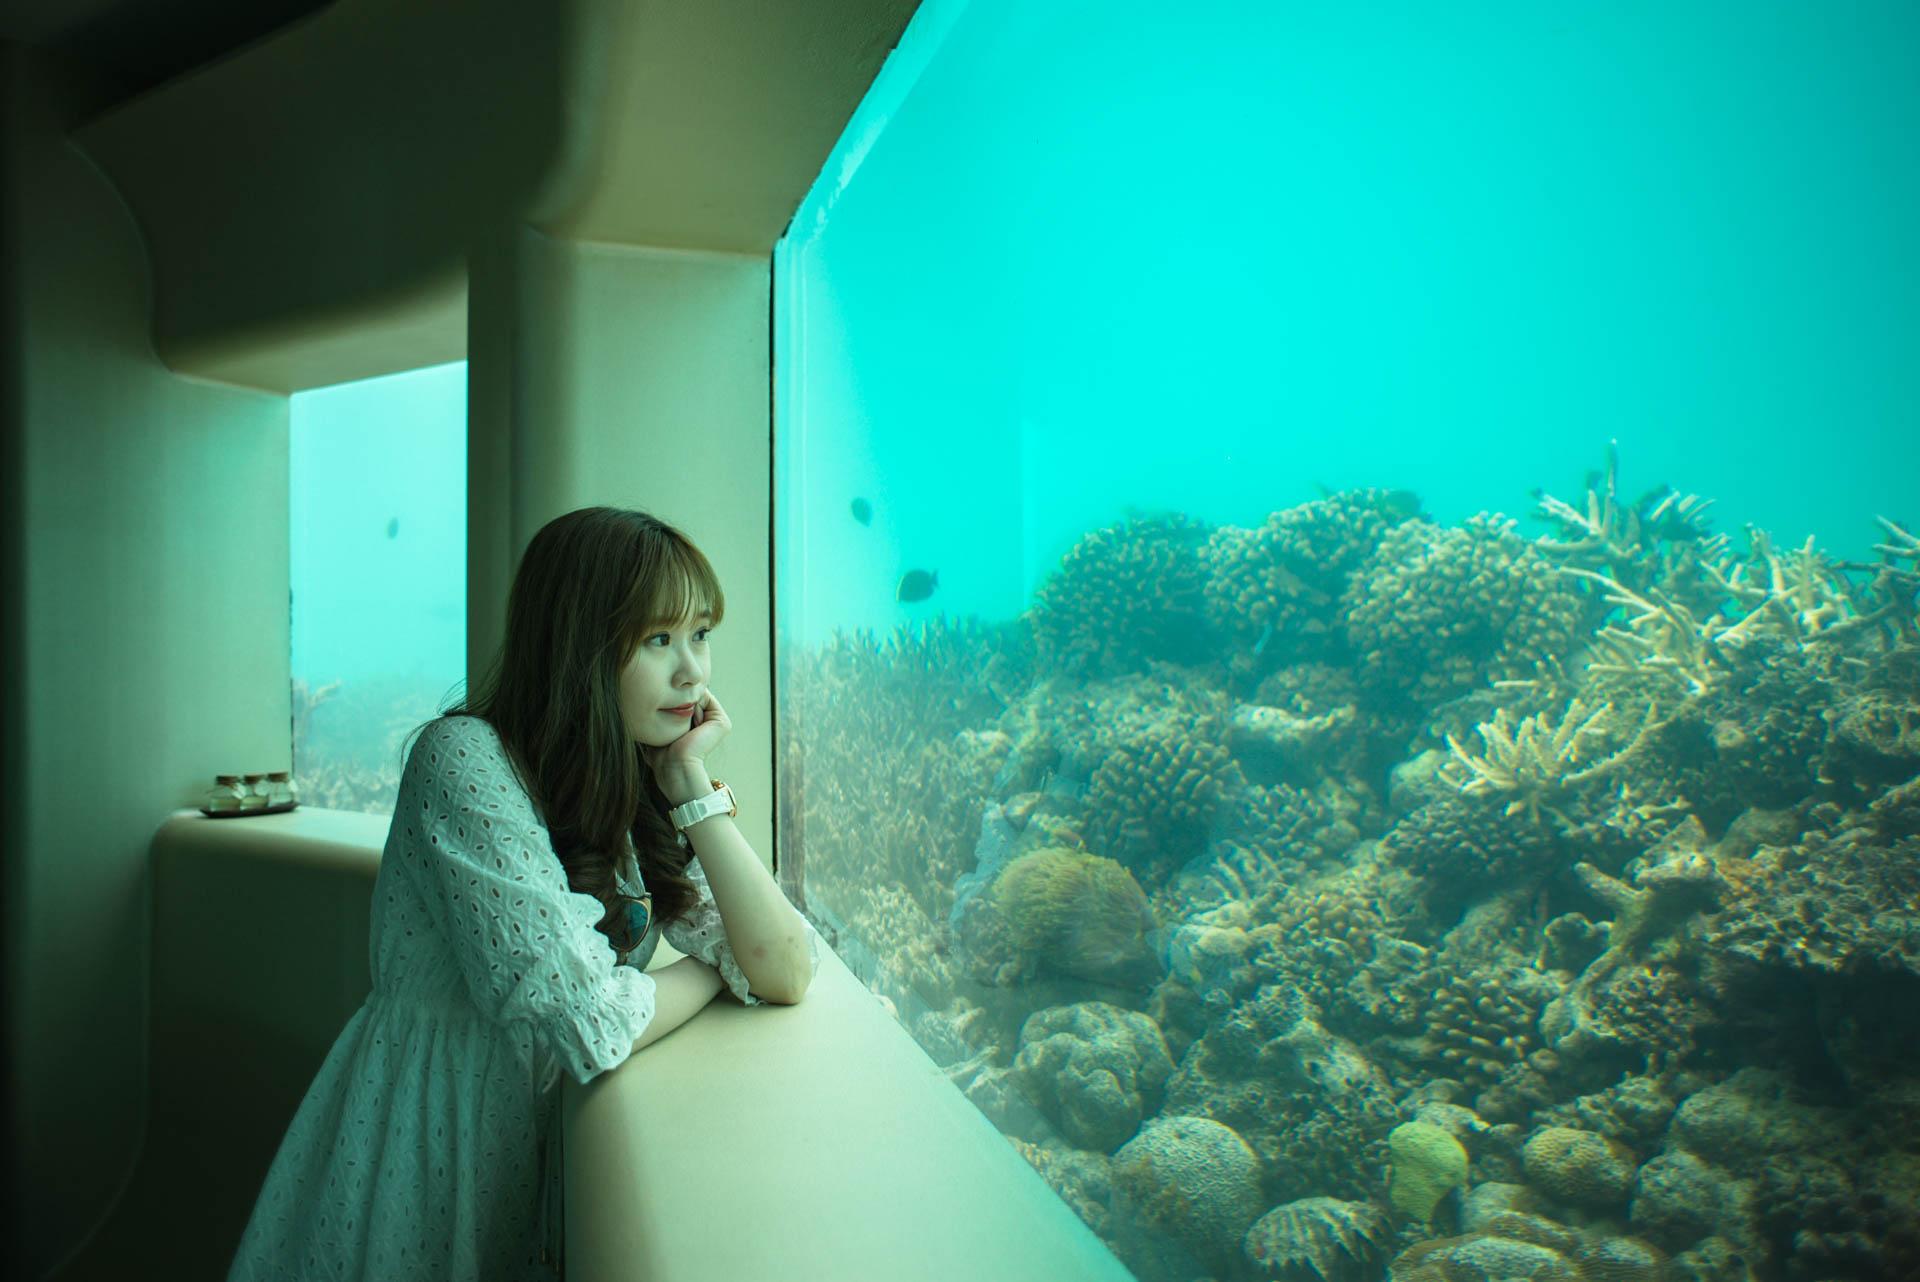 Chin Siew and Chin Yee Honeymoon in Maldives at Huvafen Fushi Resort Under Water Spa 17